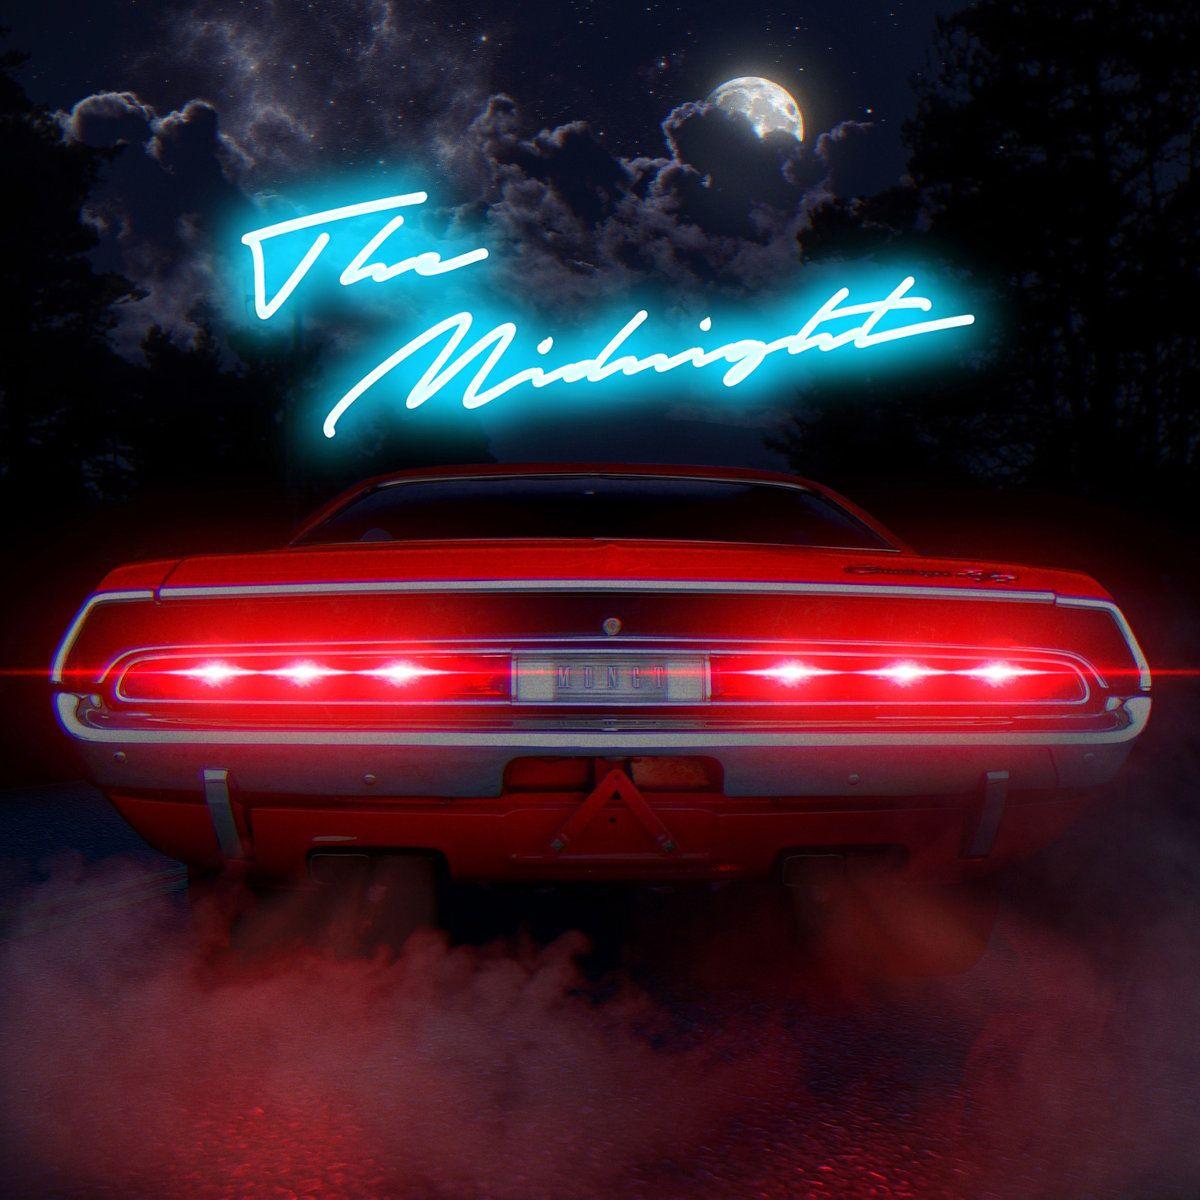 Pin On Album Cover